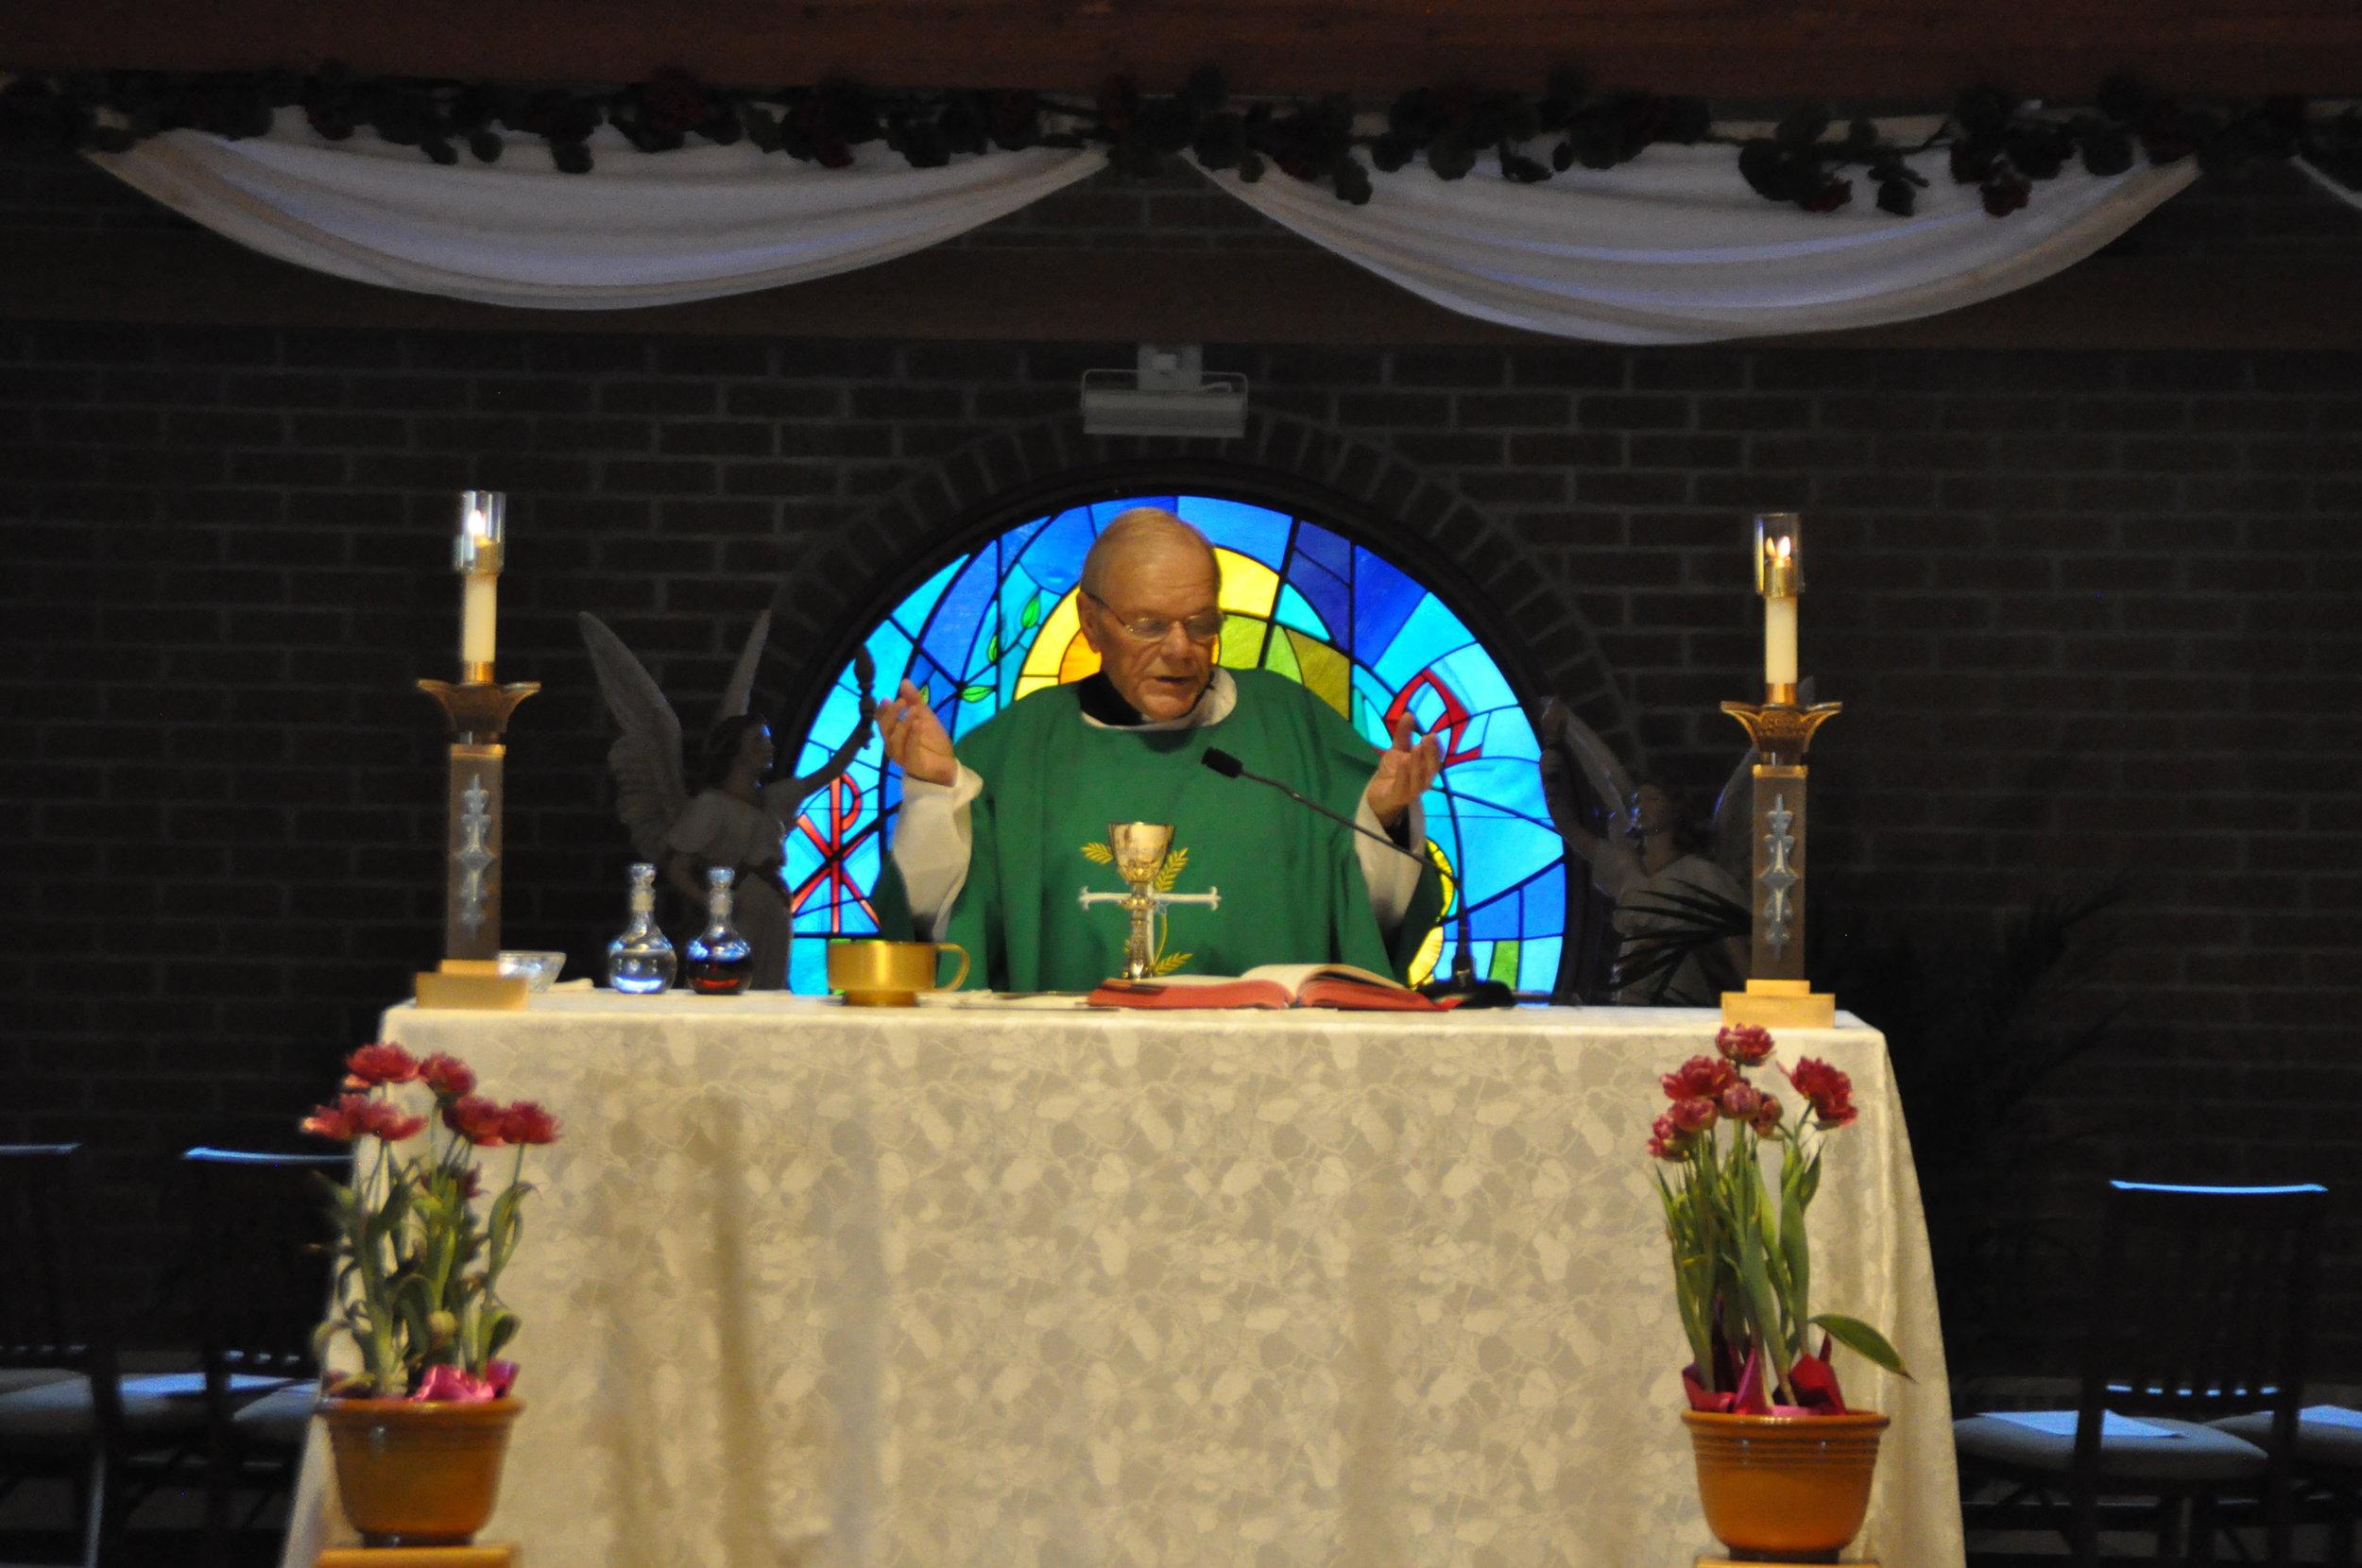 Father Lajack